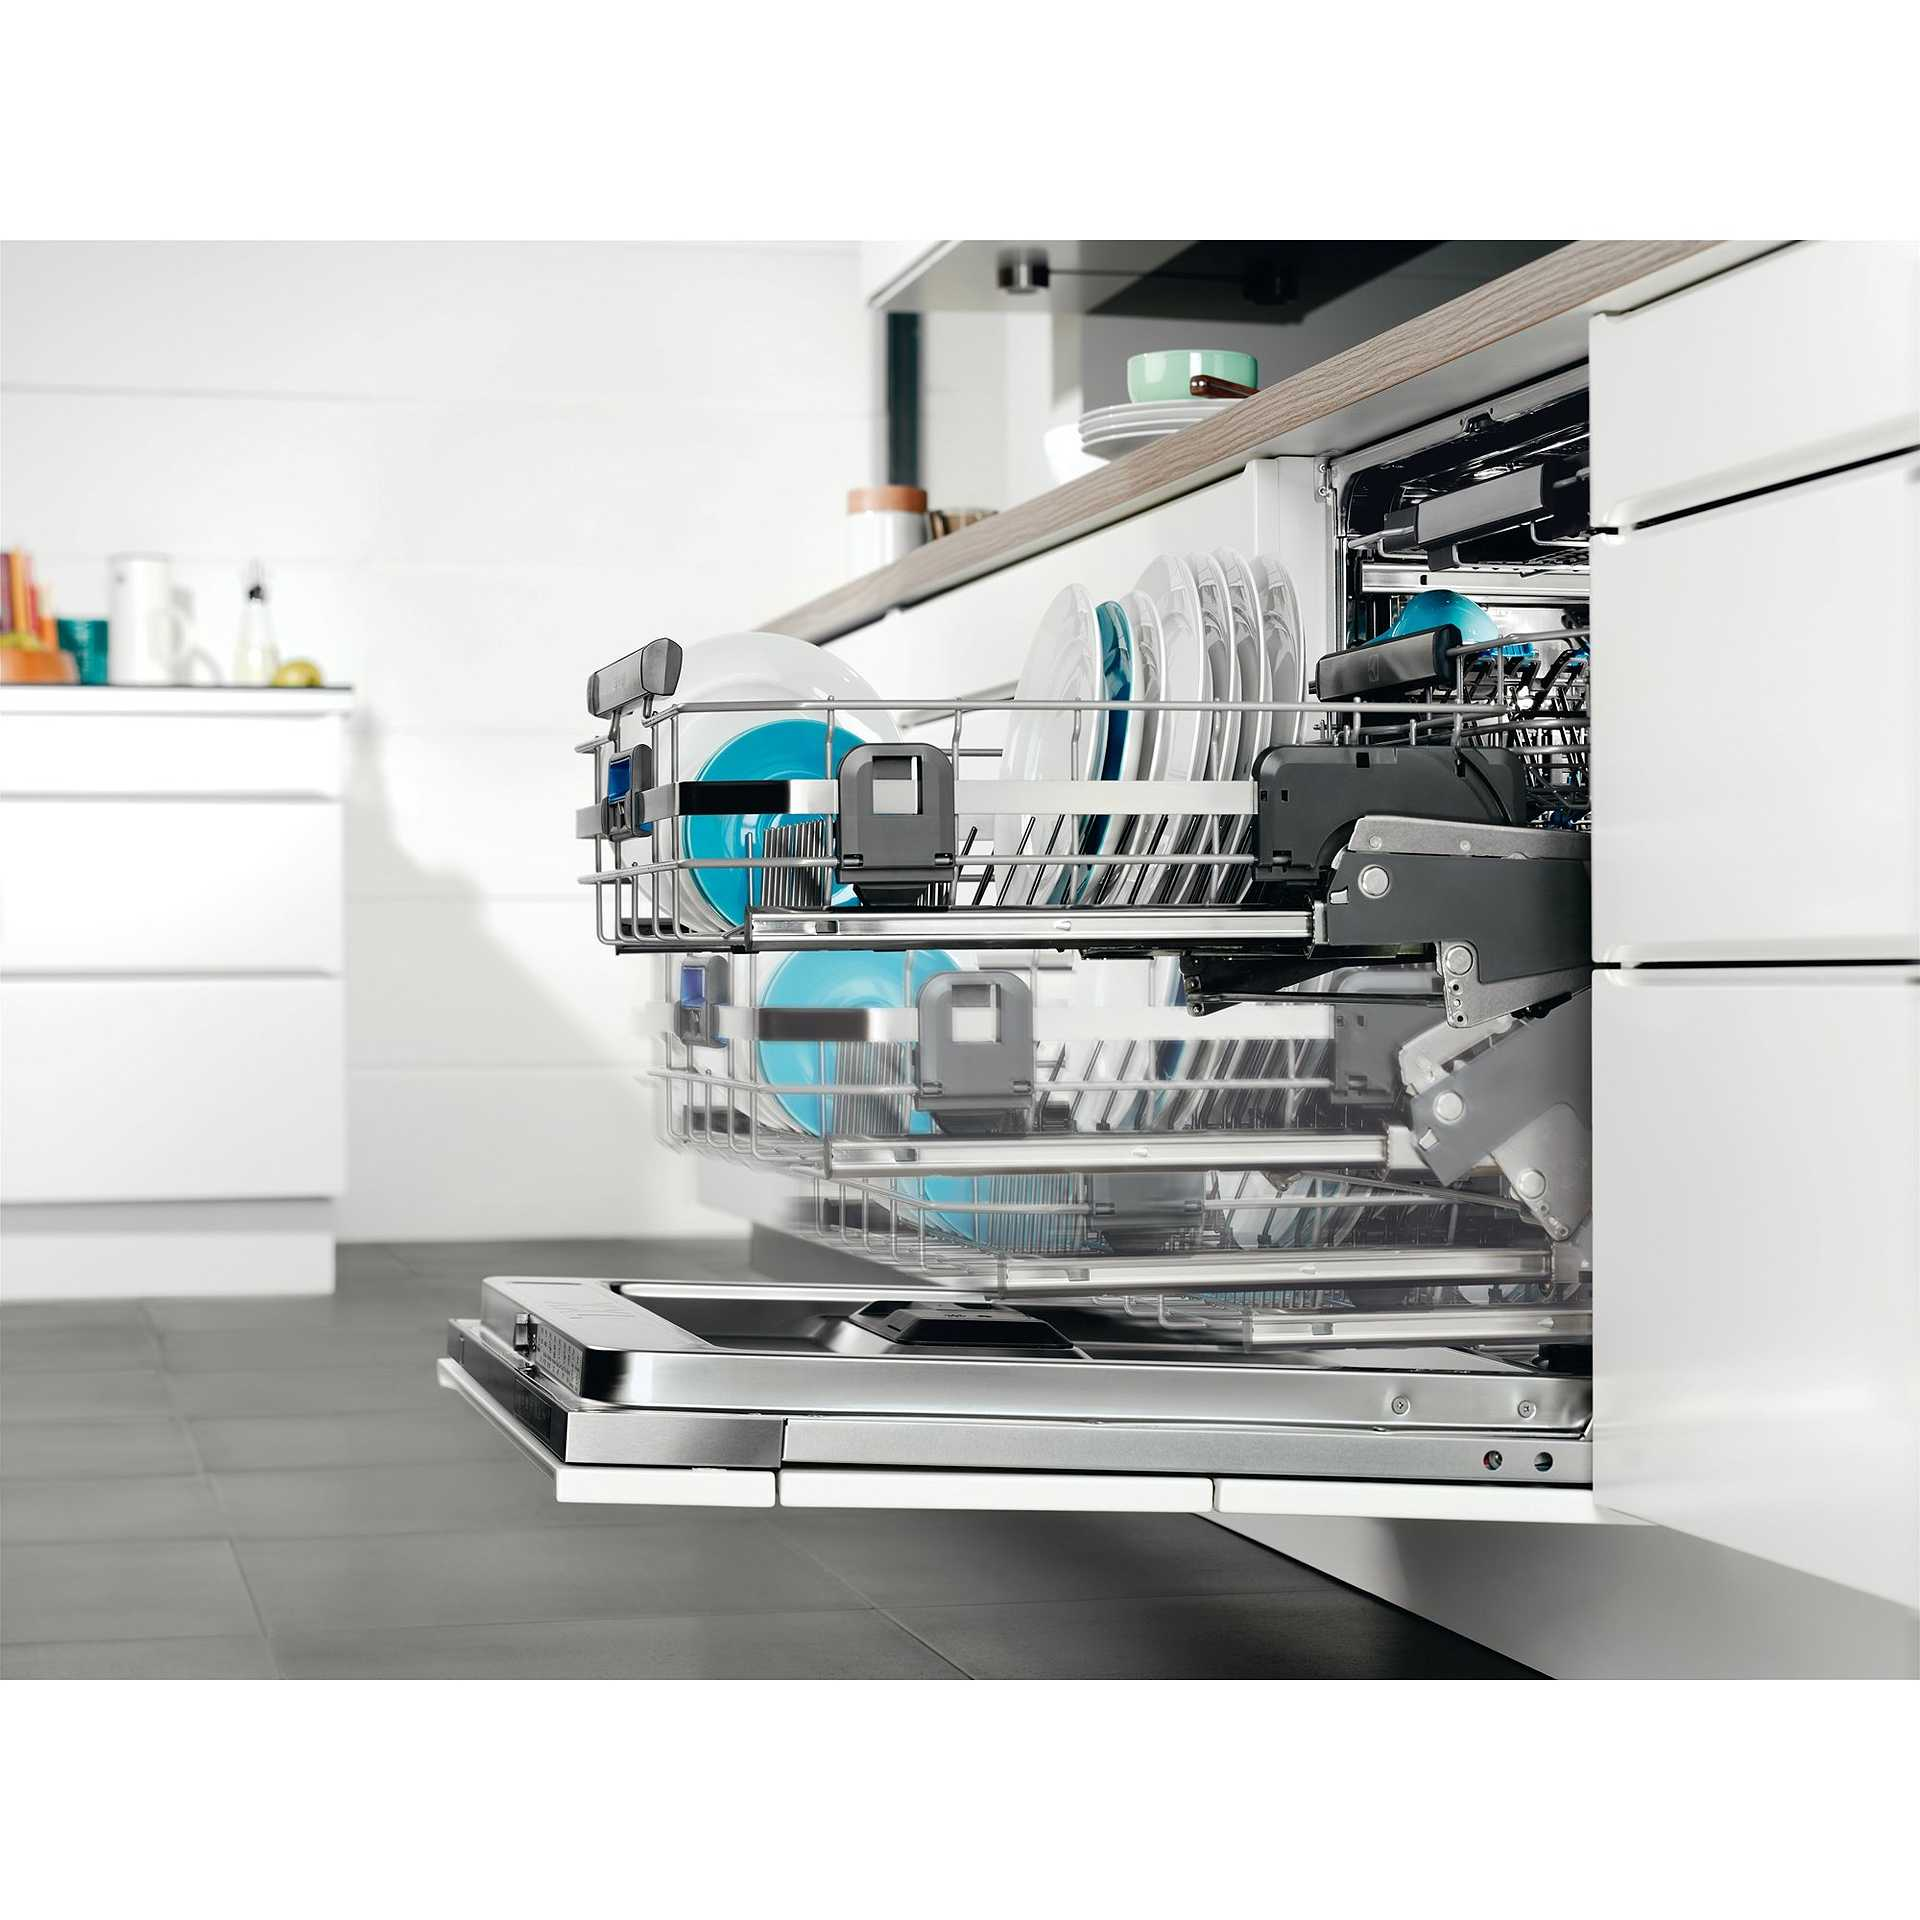 Stunning Lavastoviglie Rex Incasso Pictures - Home Design ...